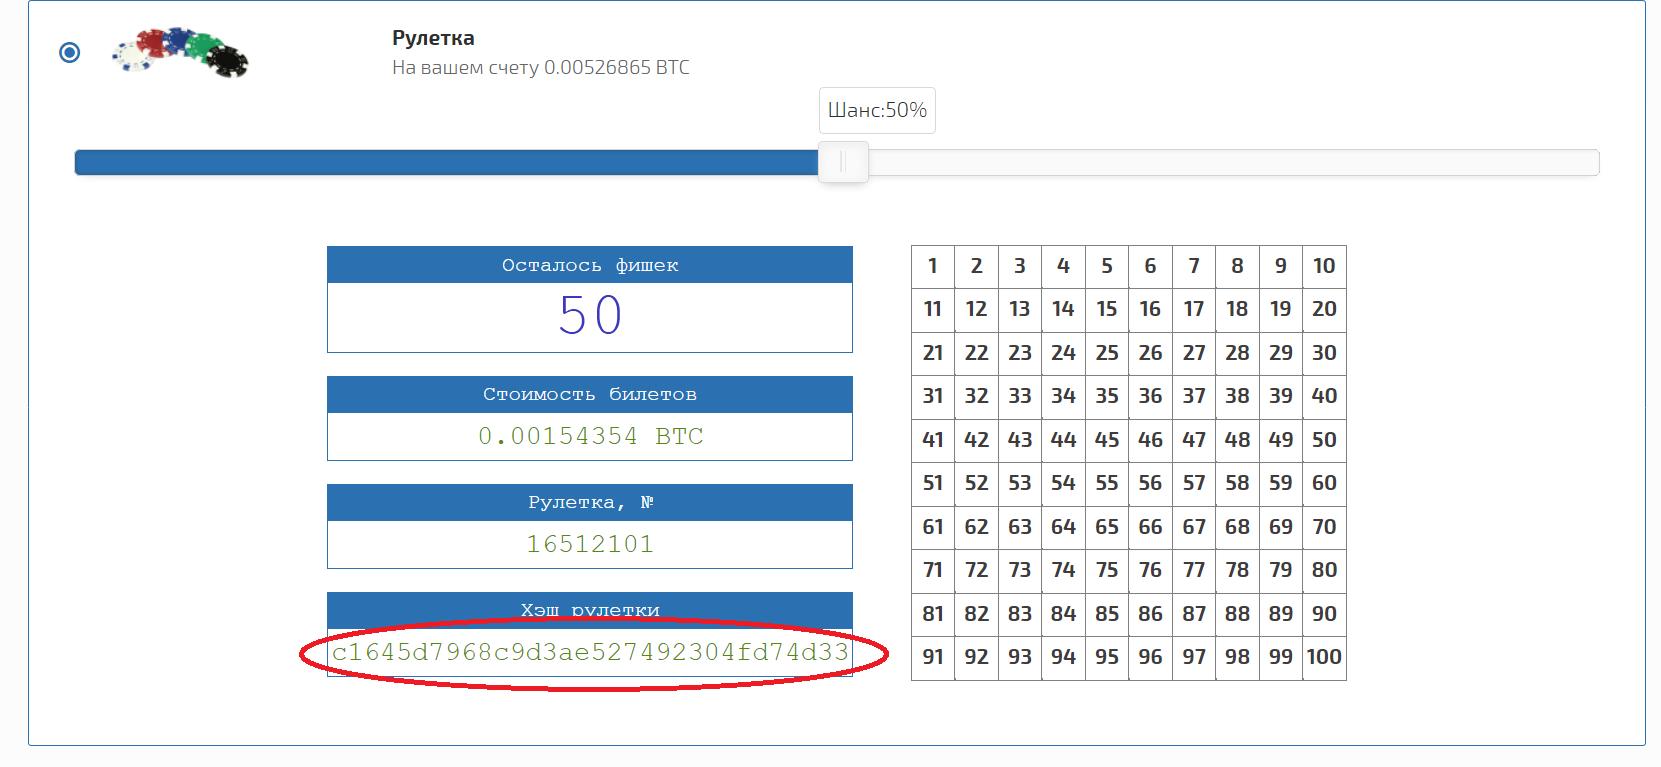 e040763d458ea951e664a - Рулетка при заказе на HYDRA – правила и подробности работы.